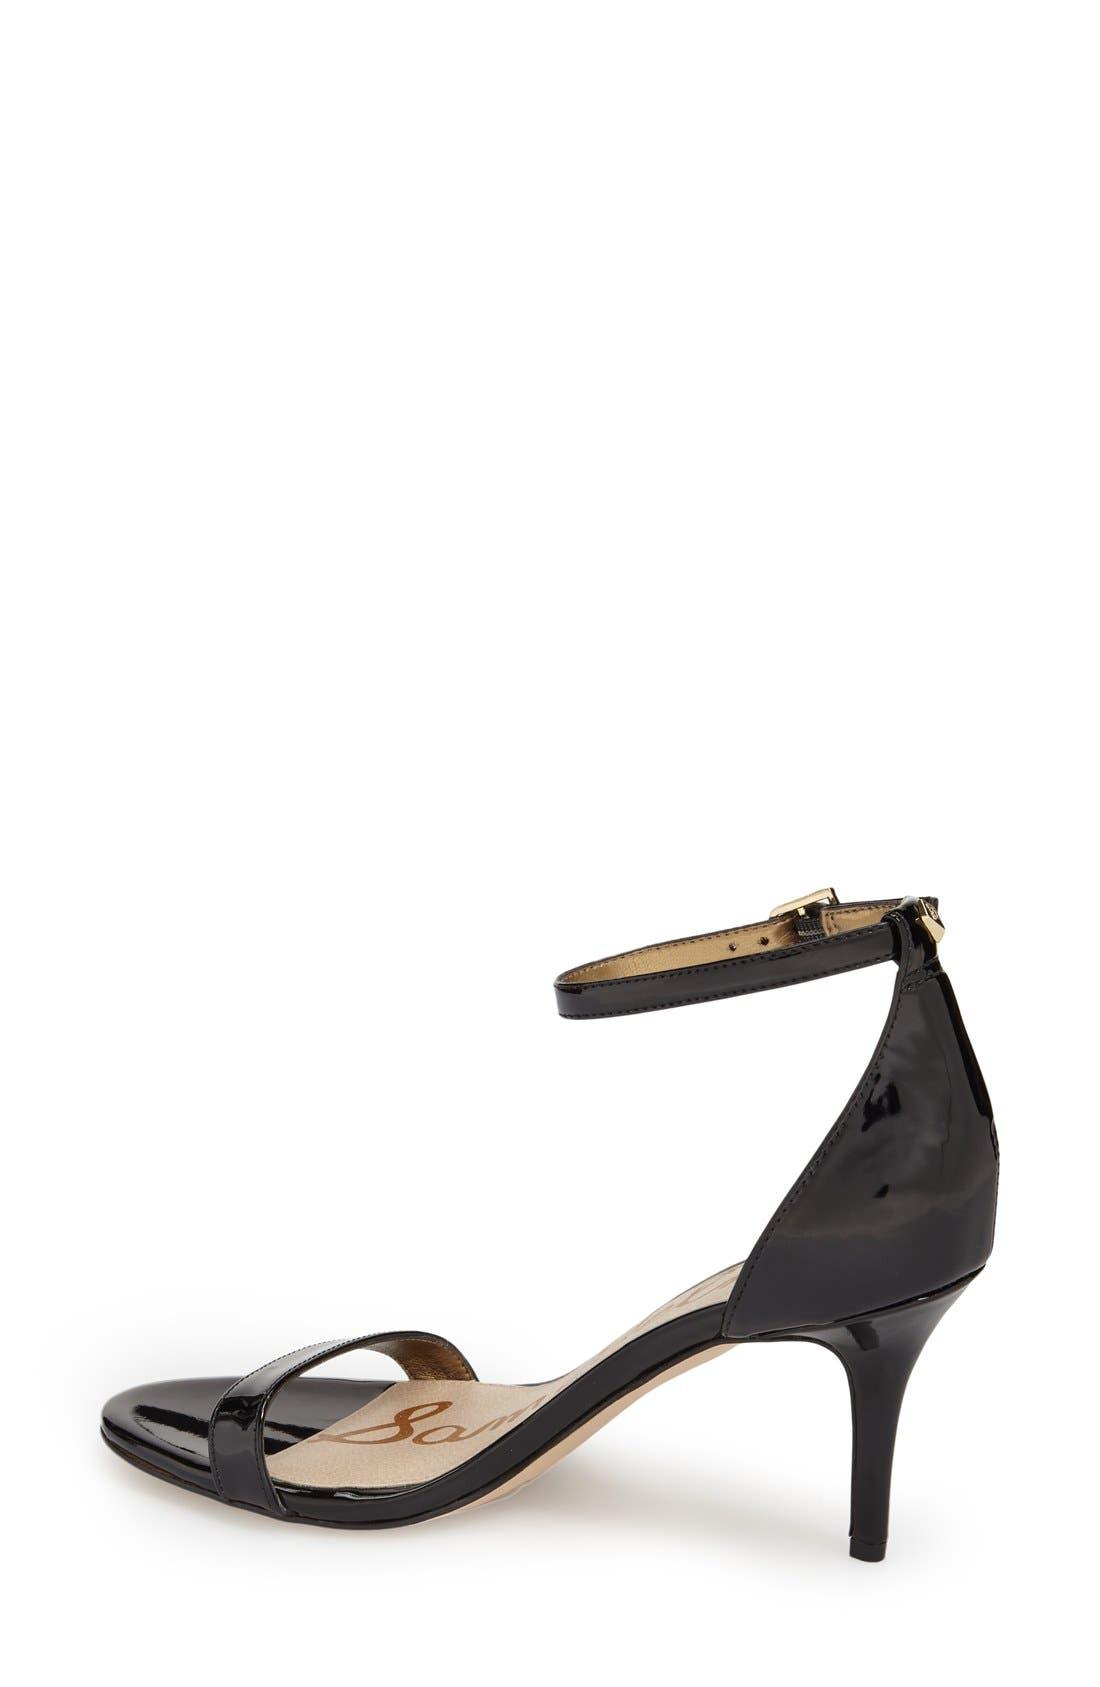 ,                             'Patti' Ankle Strap Sandal,                             Alternate thumbnail 143, color,                             002